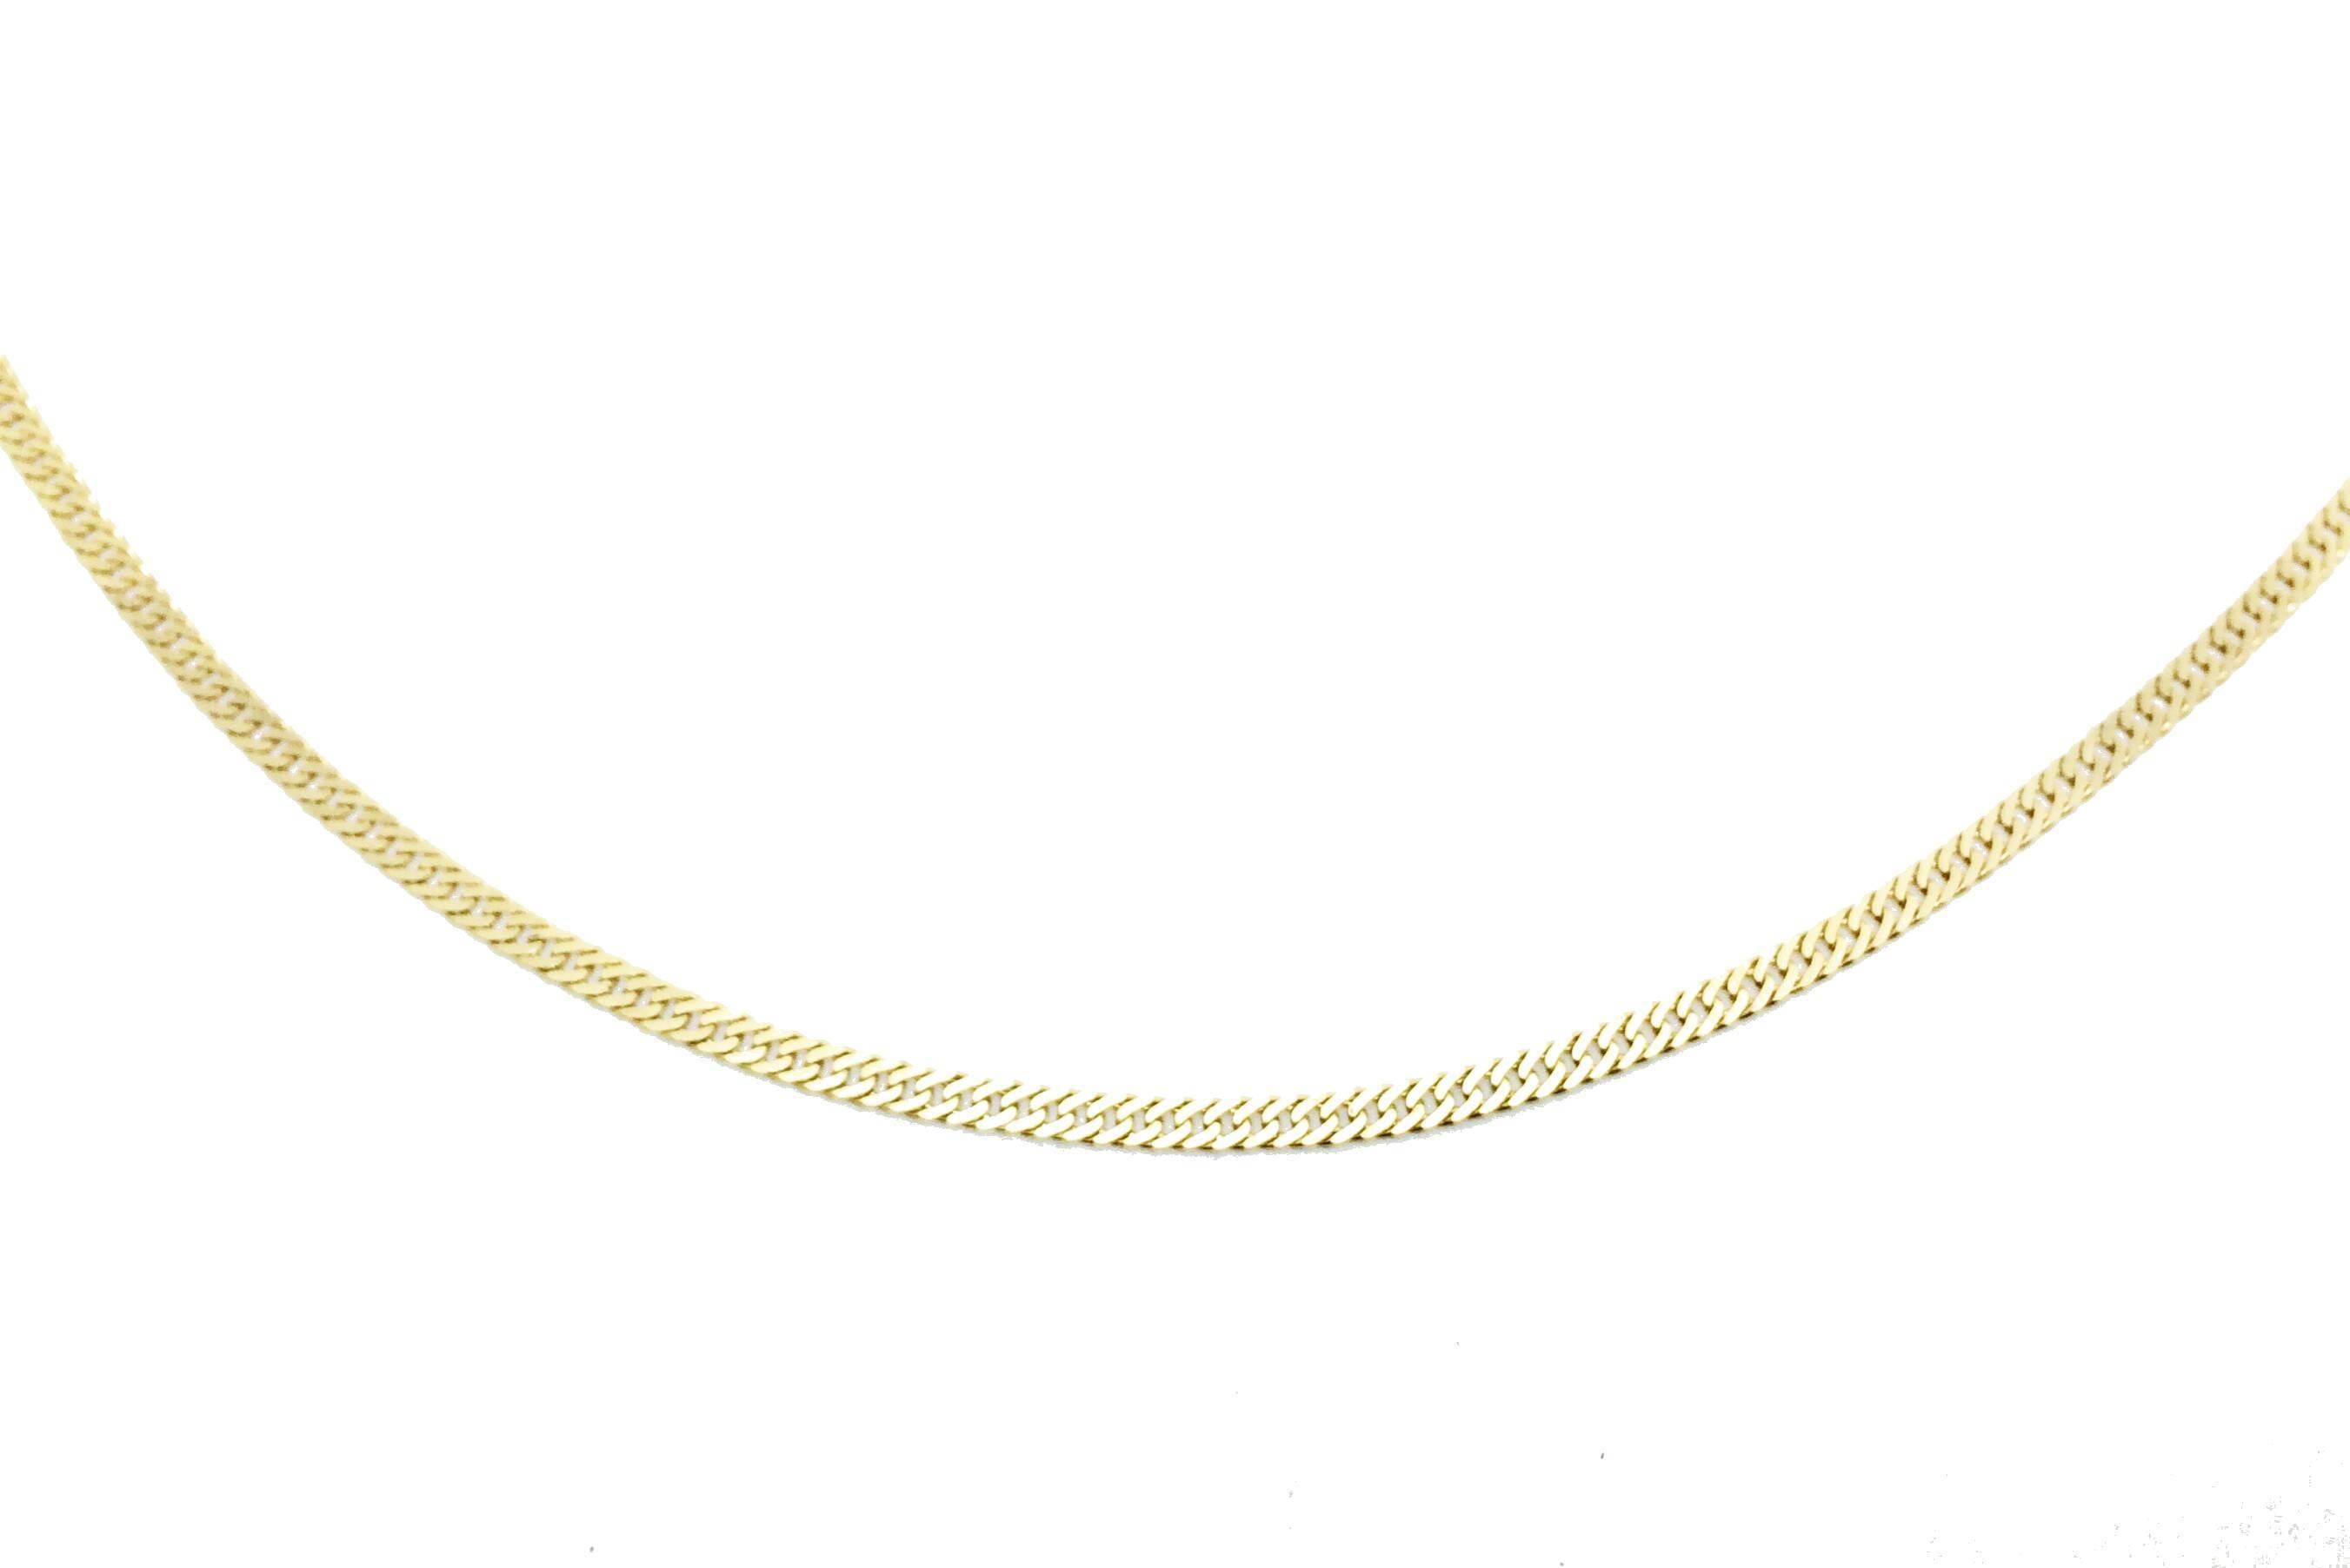 91ac69e27b26 ... Cadena de oro 50 cm gargantilla de oro Joyería Juan Luis Larráyoz  Pamplona Navarra Joyería Online